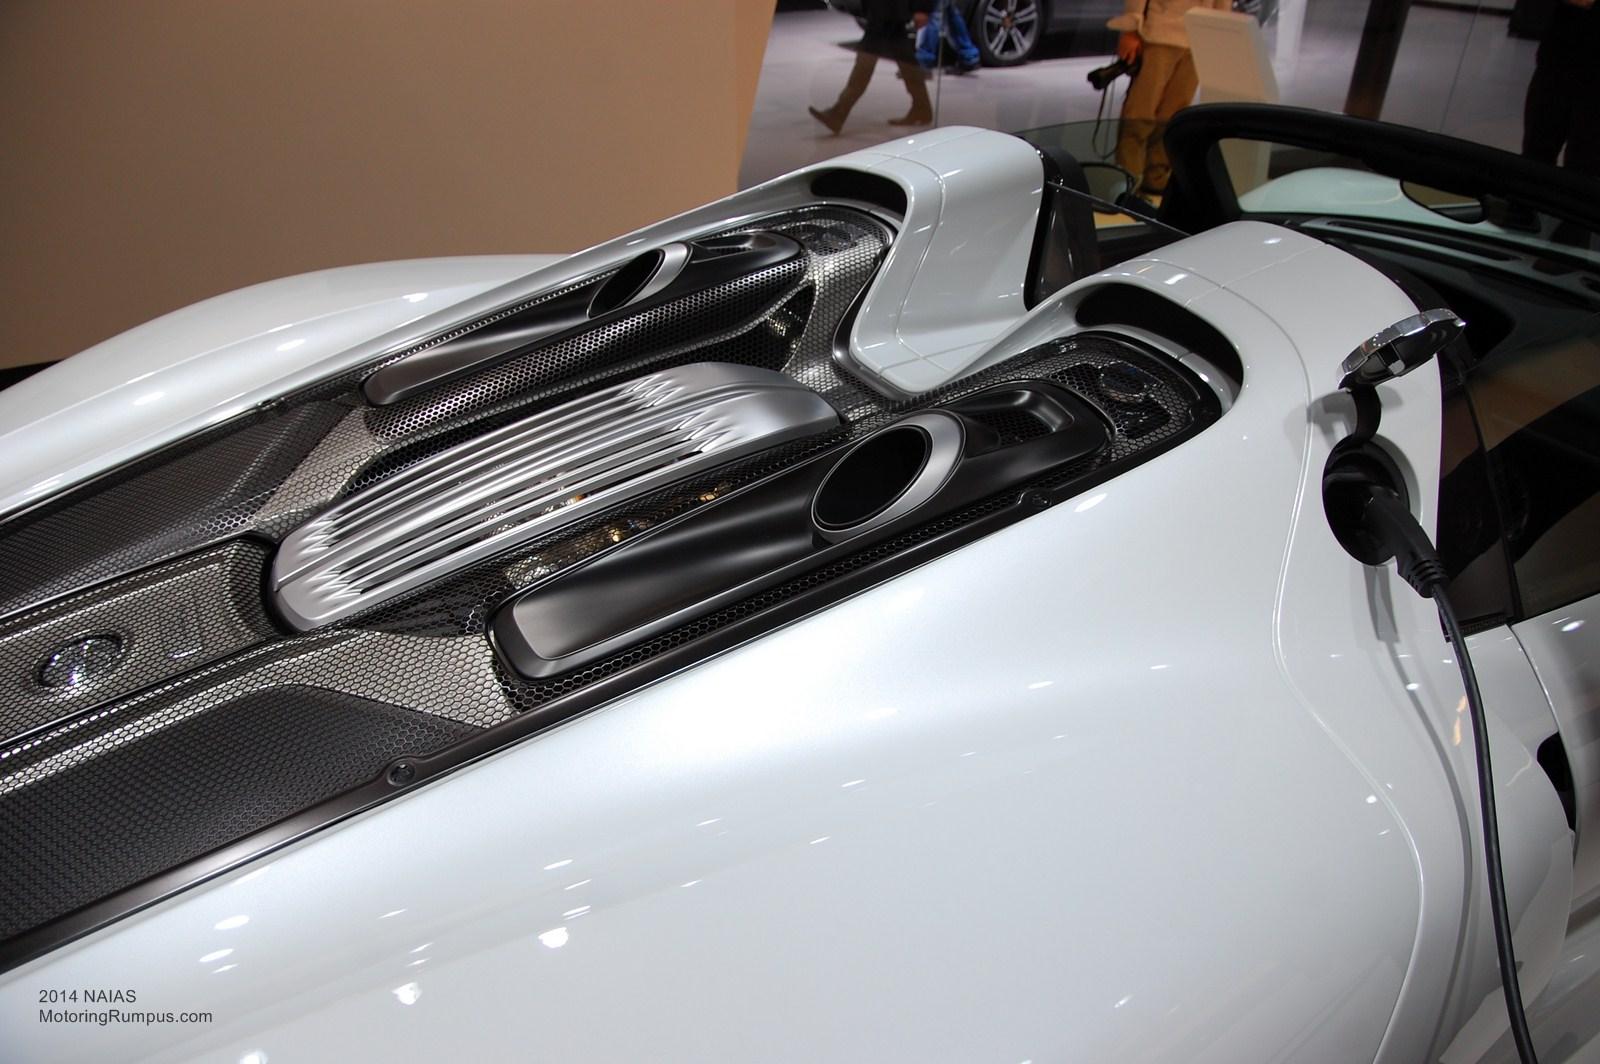 2014 NAIAS Porsche 918 Spyder Engine Cover